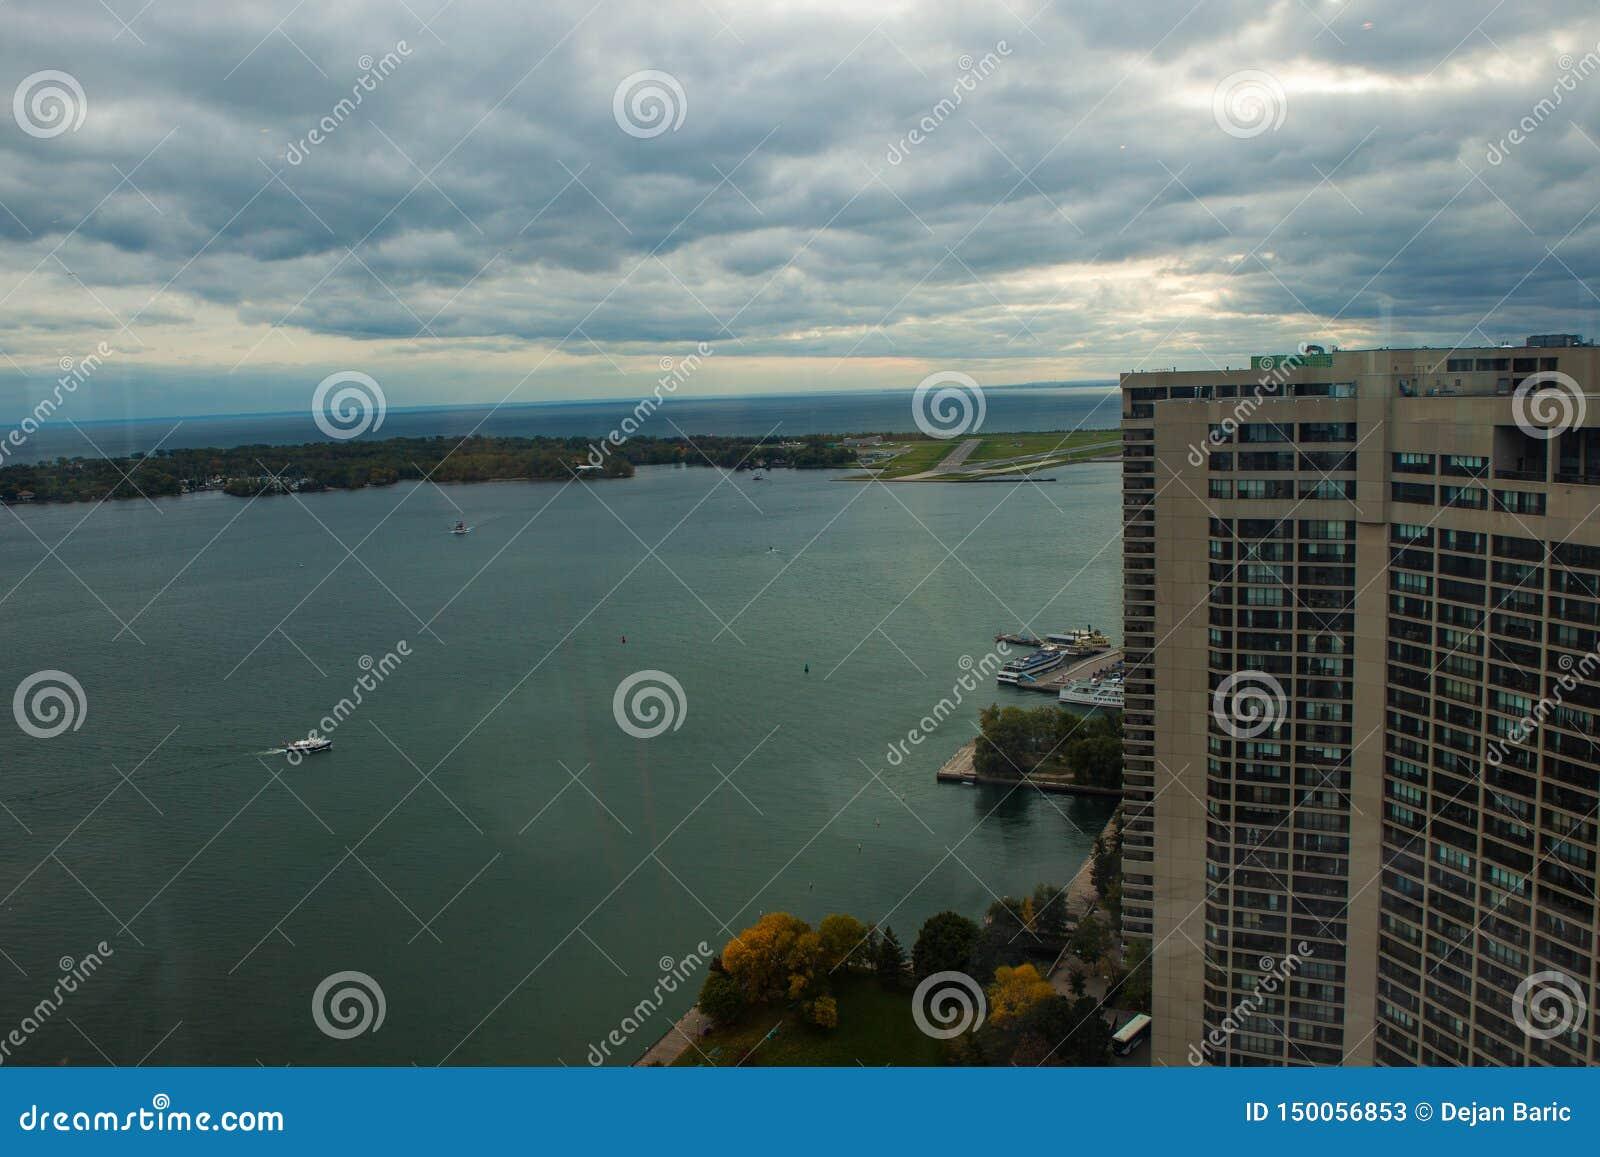 Toronto, CANADA - 10 novembre 2018: Ontario riviera a Toronto occupata